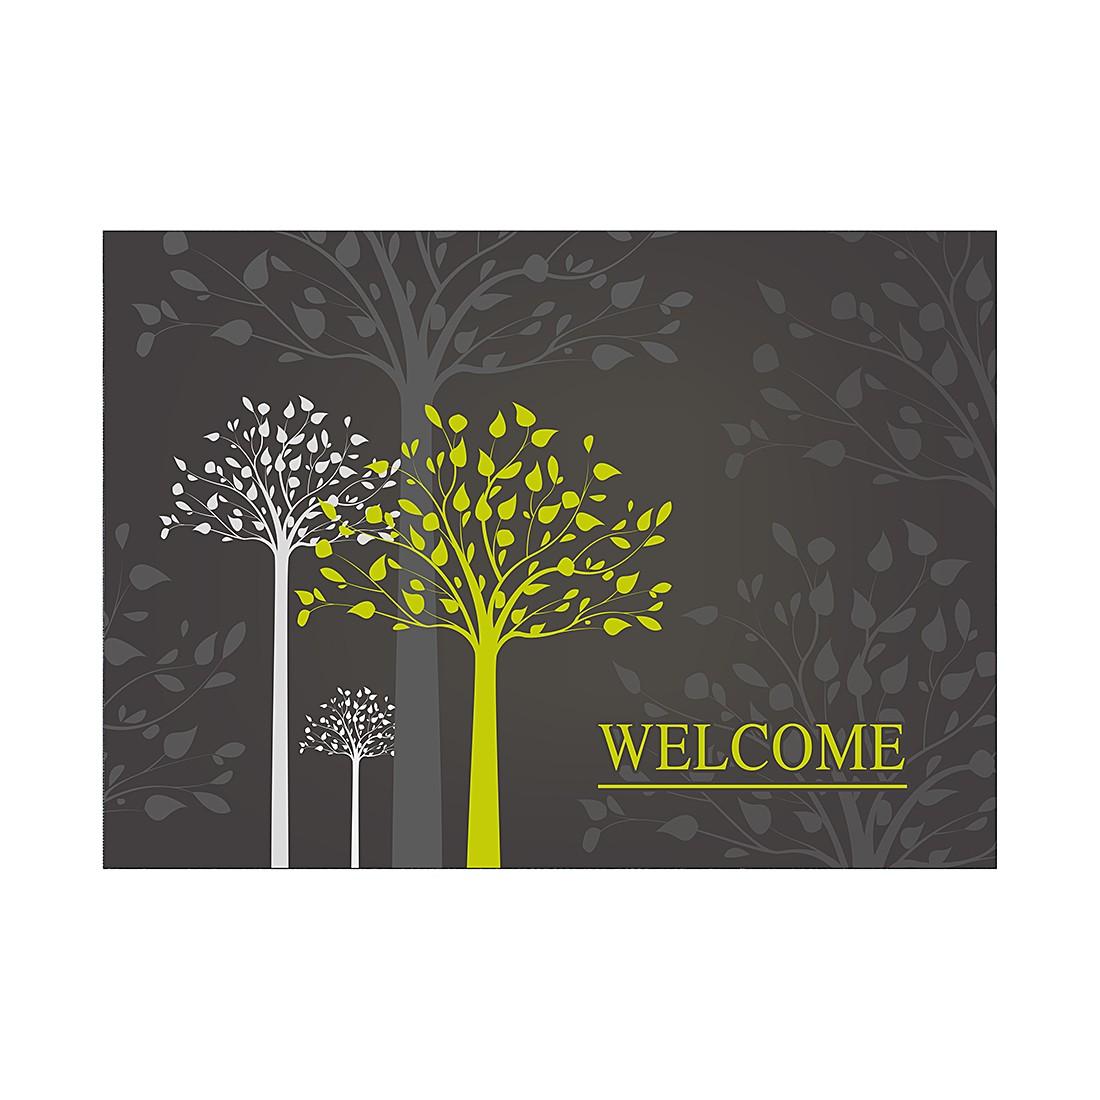 Fußmatte Welcome – Mehrfarbig, Pro Art online bestellen